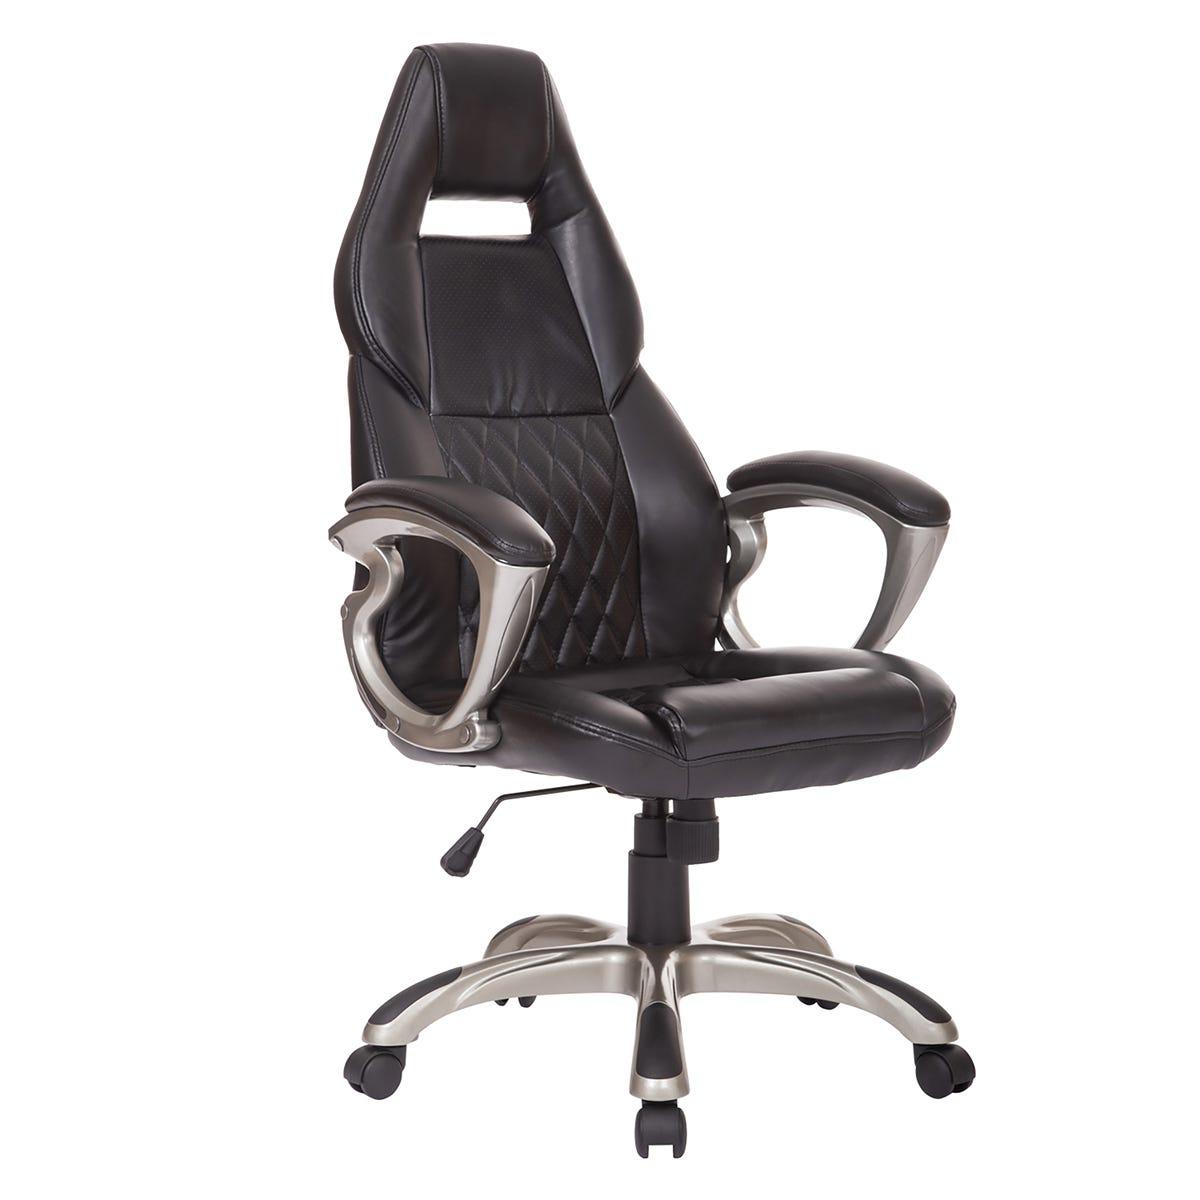 Zennor Verti PU Leather Office Chair - Black